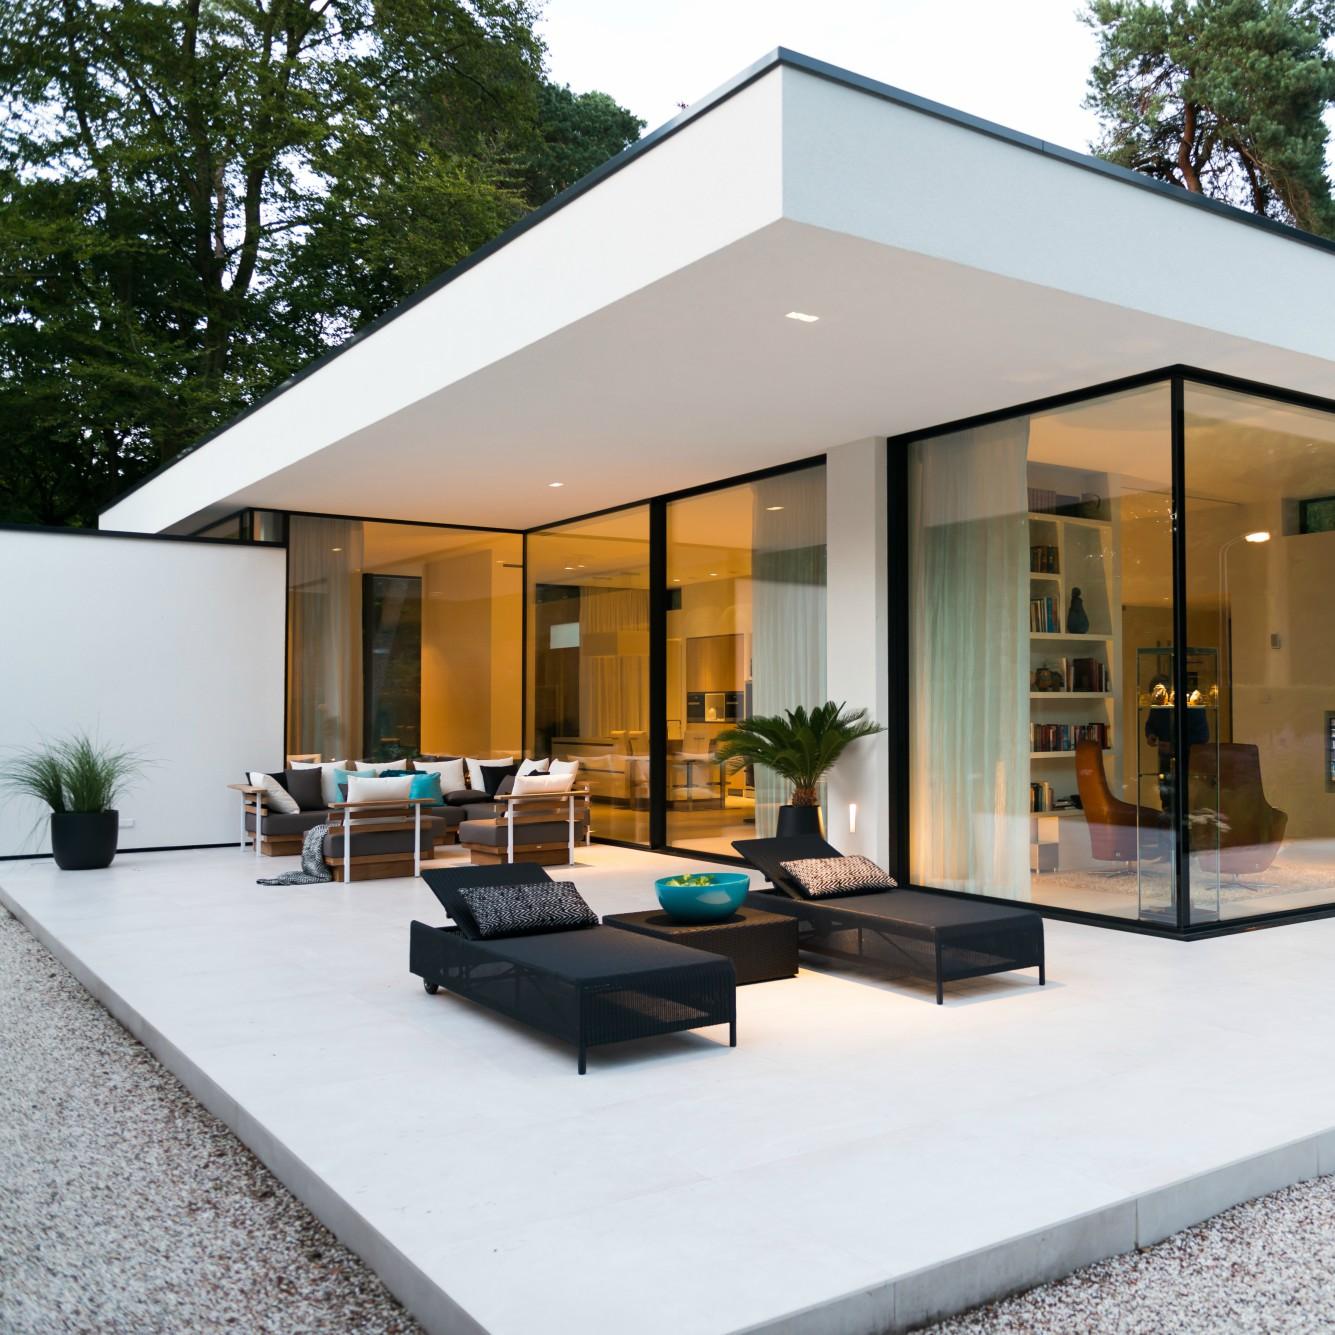 Modern Residential House Bungalow Exterior By Ar: INTERIEUR I BINNENKIJKEN I Moderne Bungalow In Ermelo